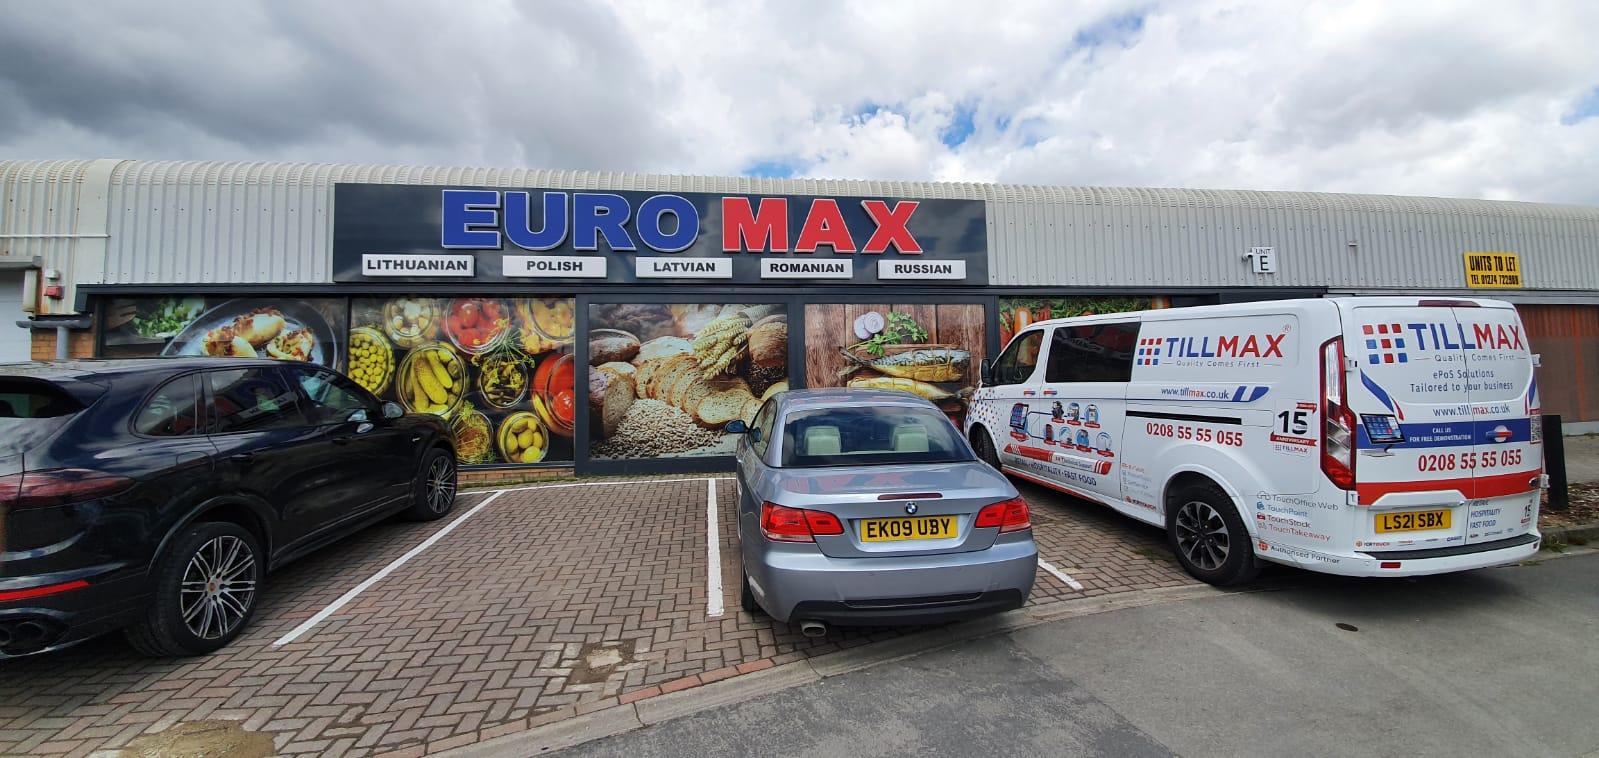 Euro Max - Leeds 15